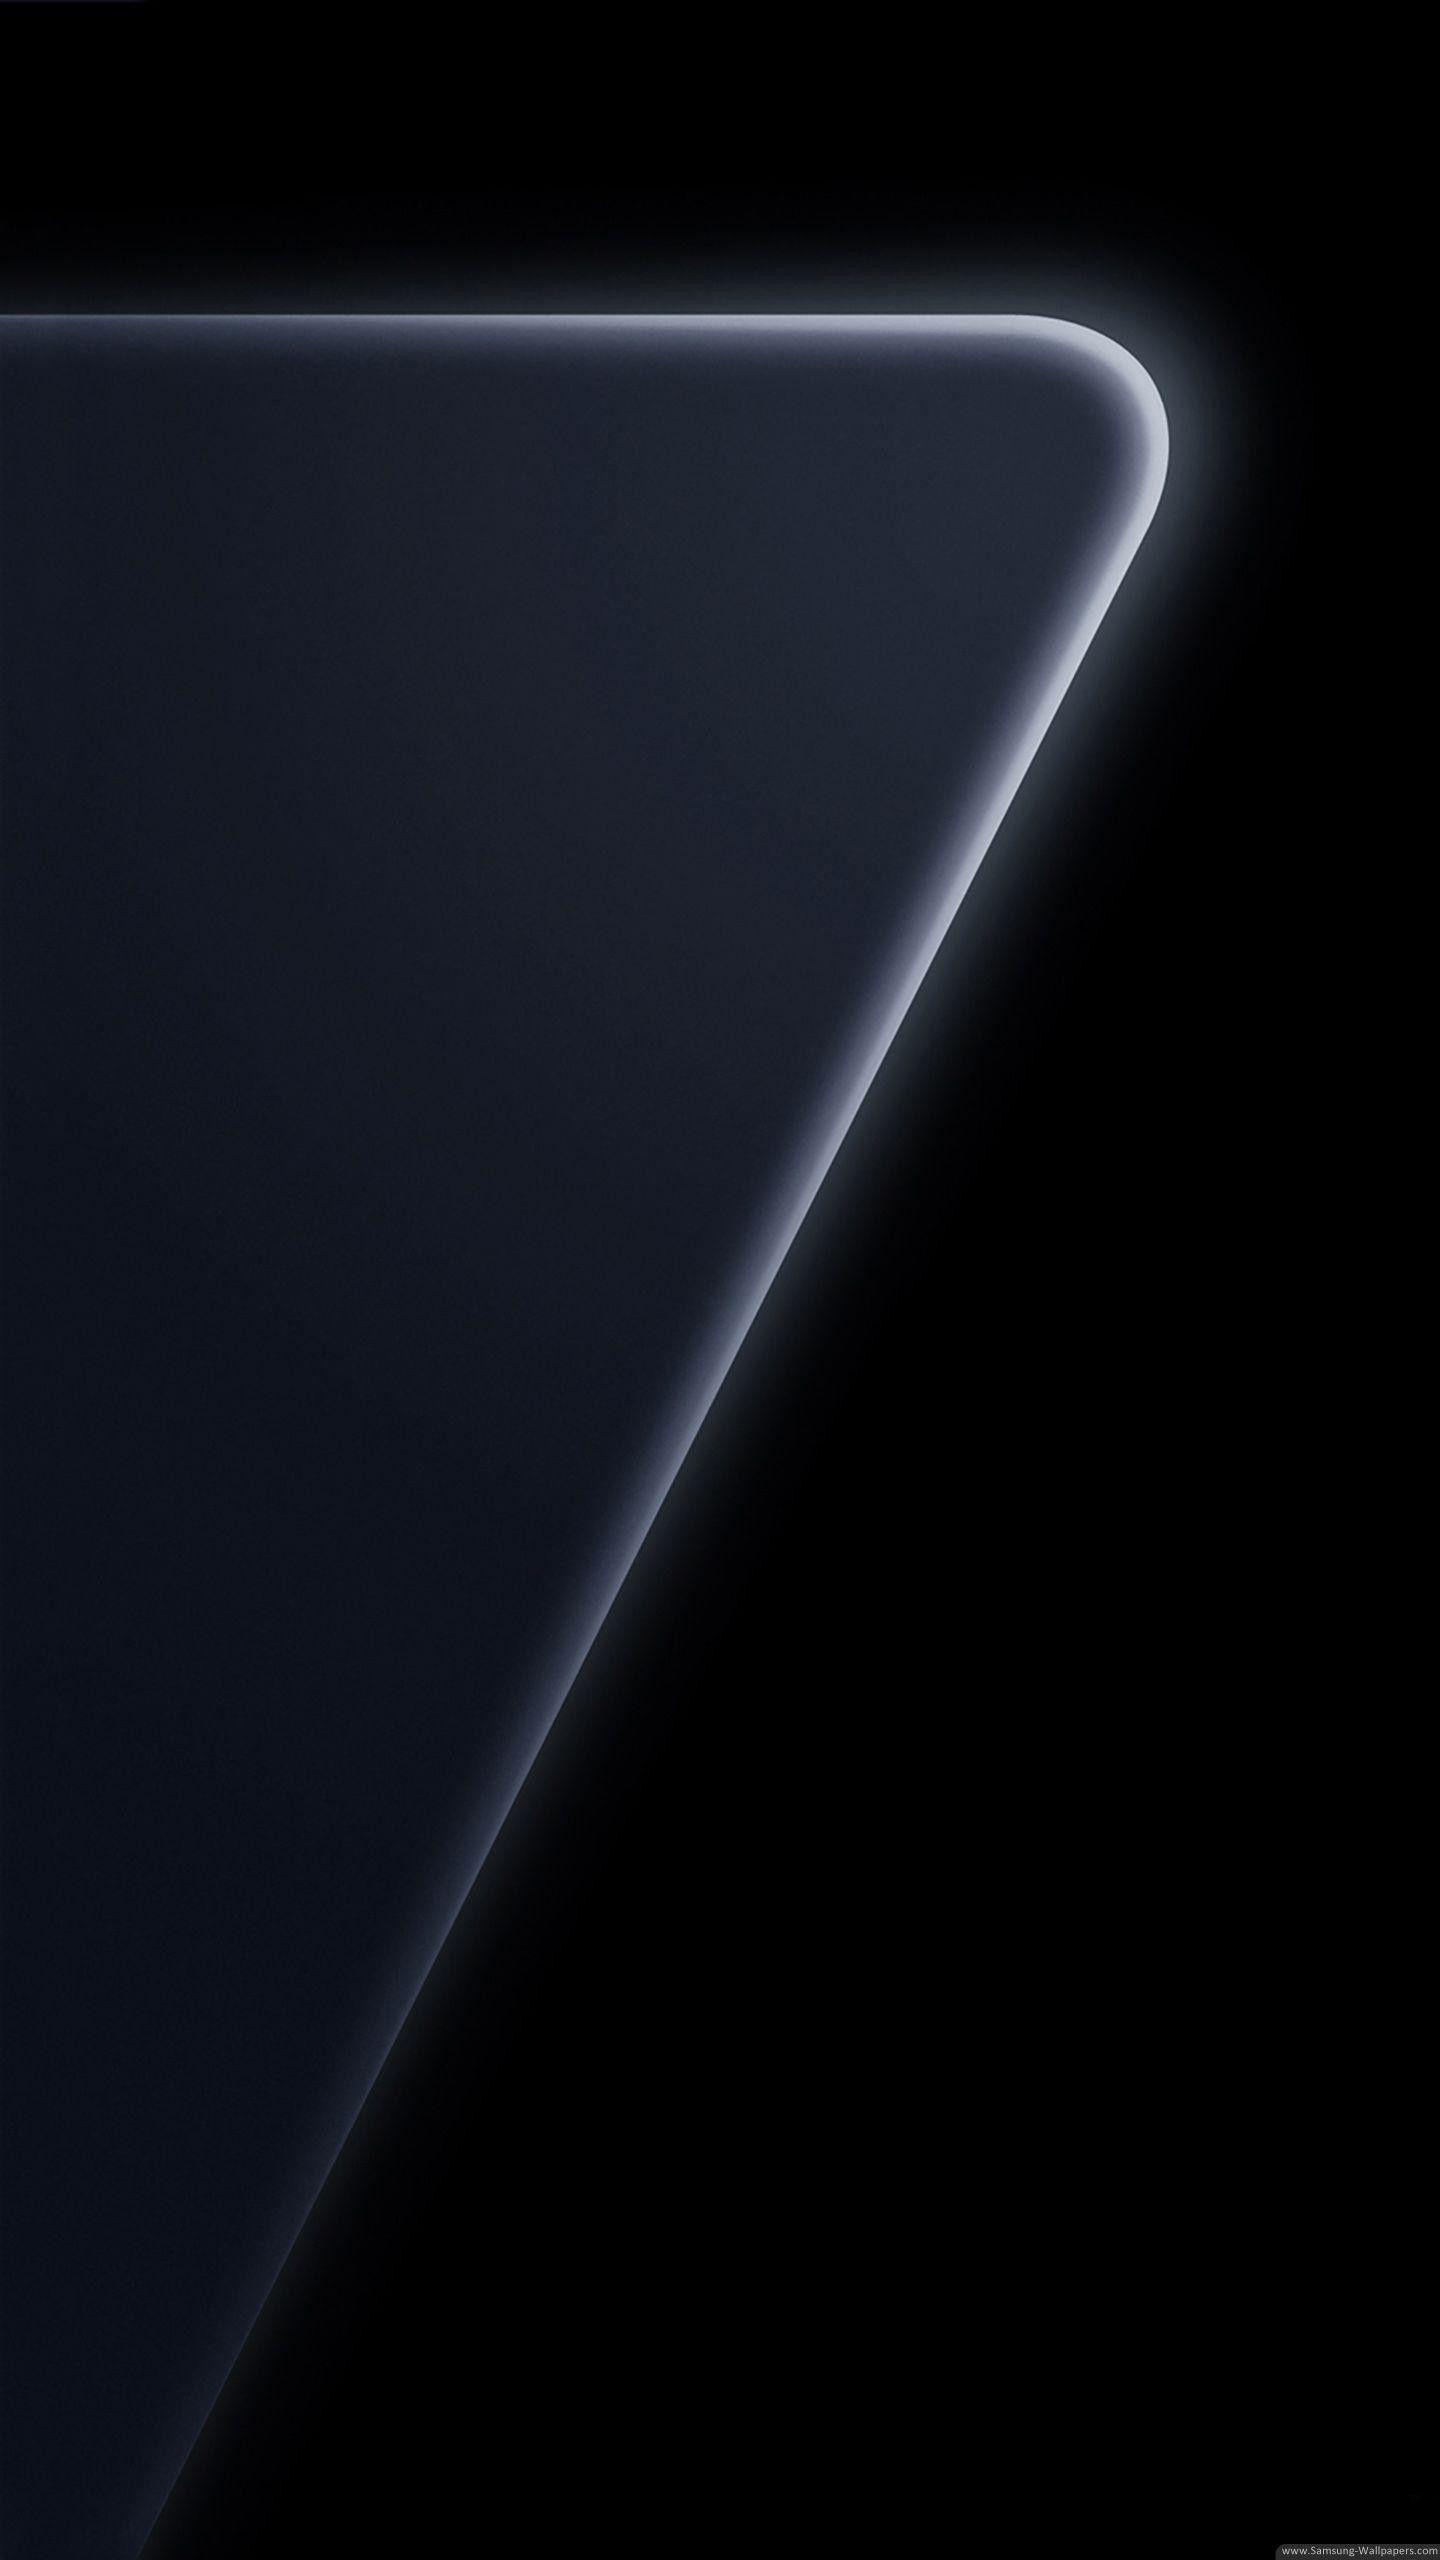 1440x2560 Wallpaper Dark Mywallpapers Site In 2020 Samsung Wallpaper Samsung Galaxy Wallpaper Qhd Wallpaper